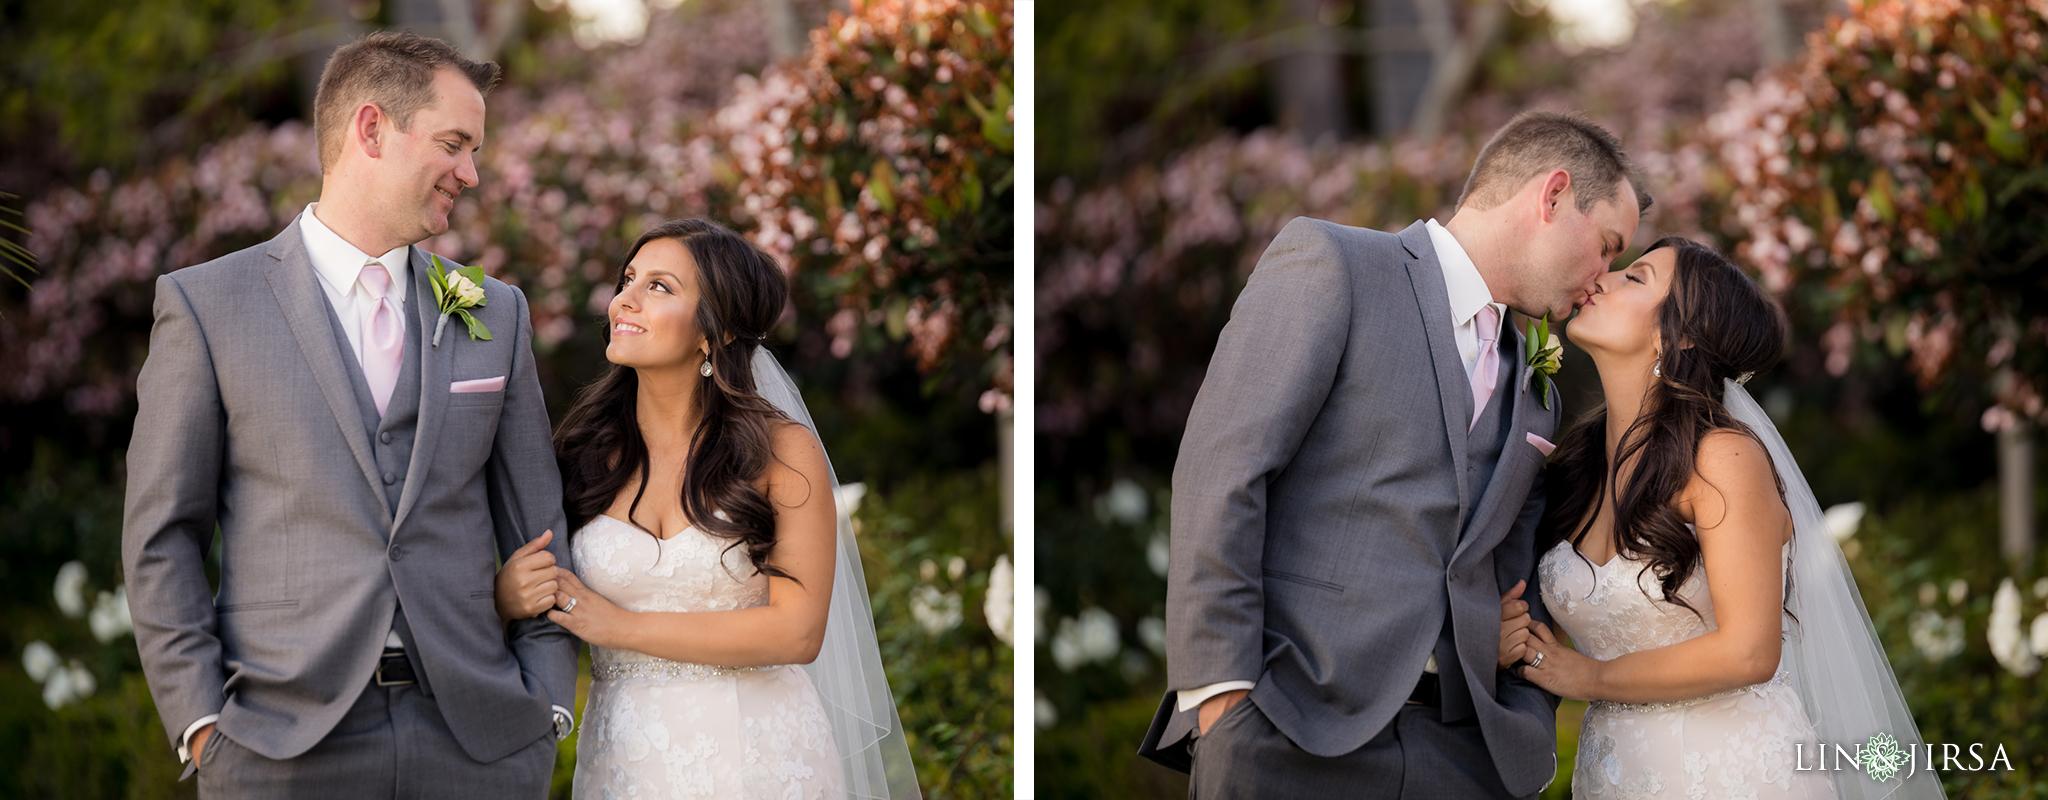 29-newport-beach-marriott-wedding-photography